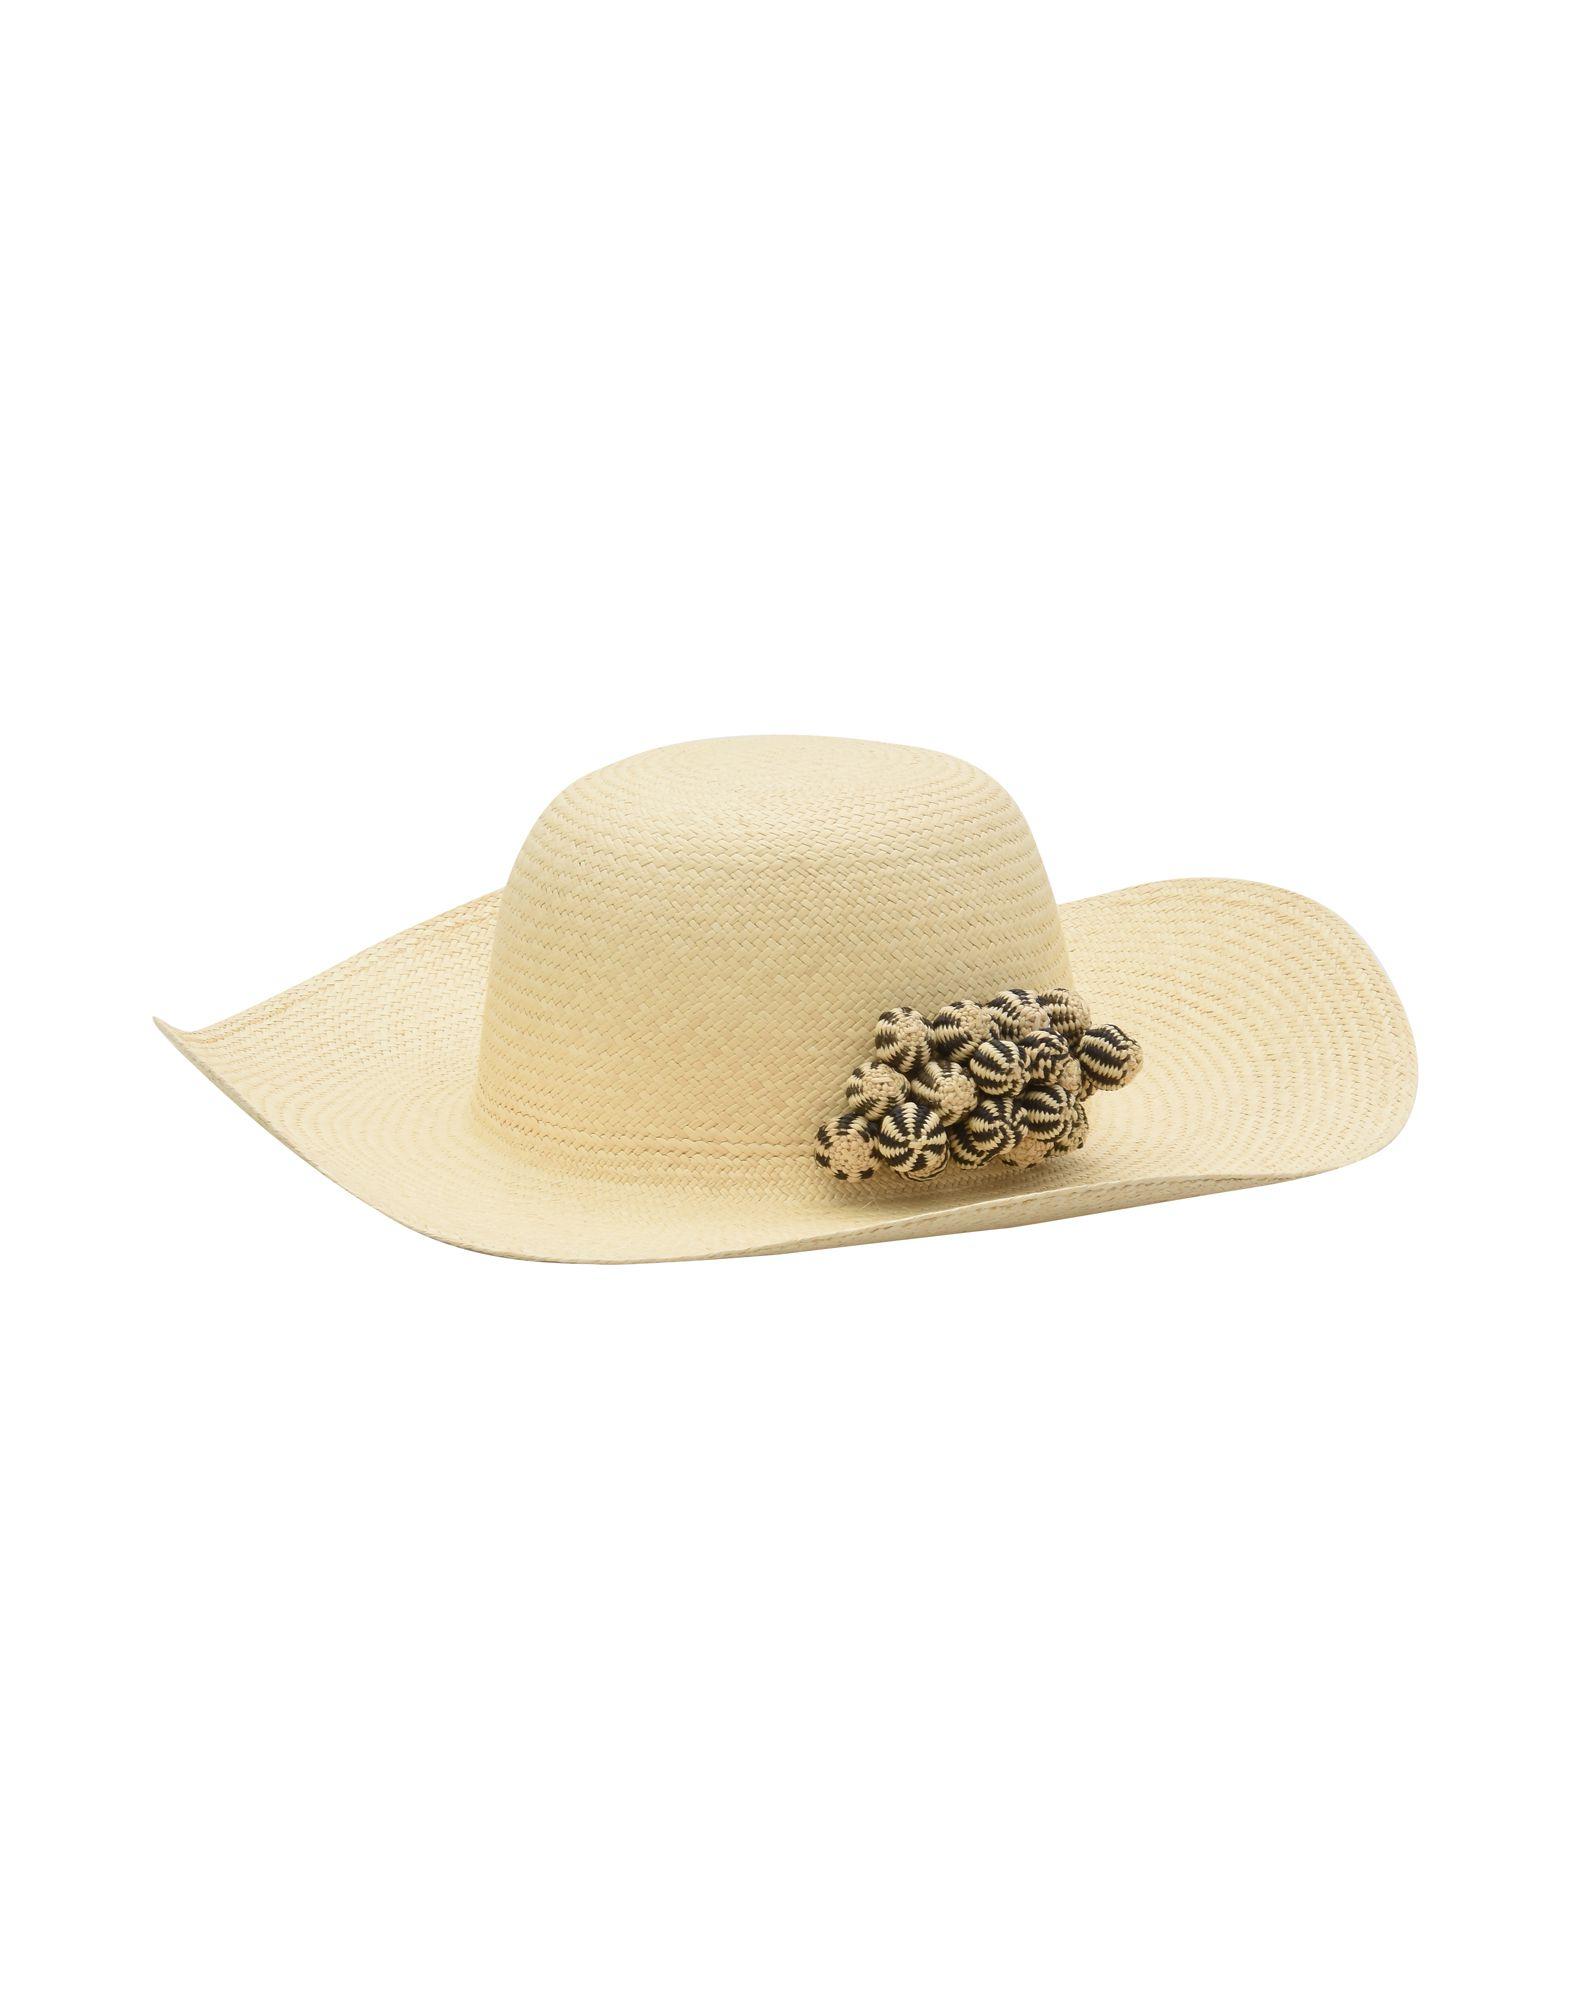 Cappello Guanabana Pamela Noche Toast - Donna - Acquista online su